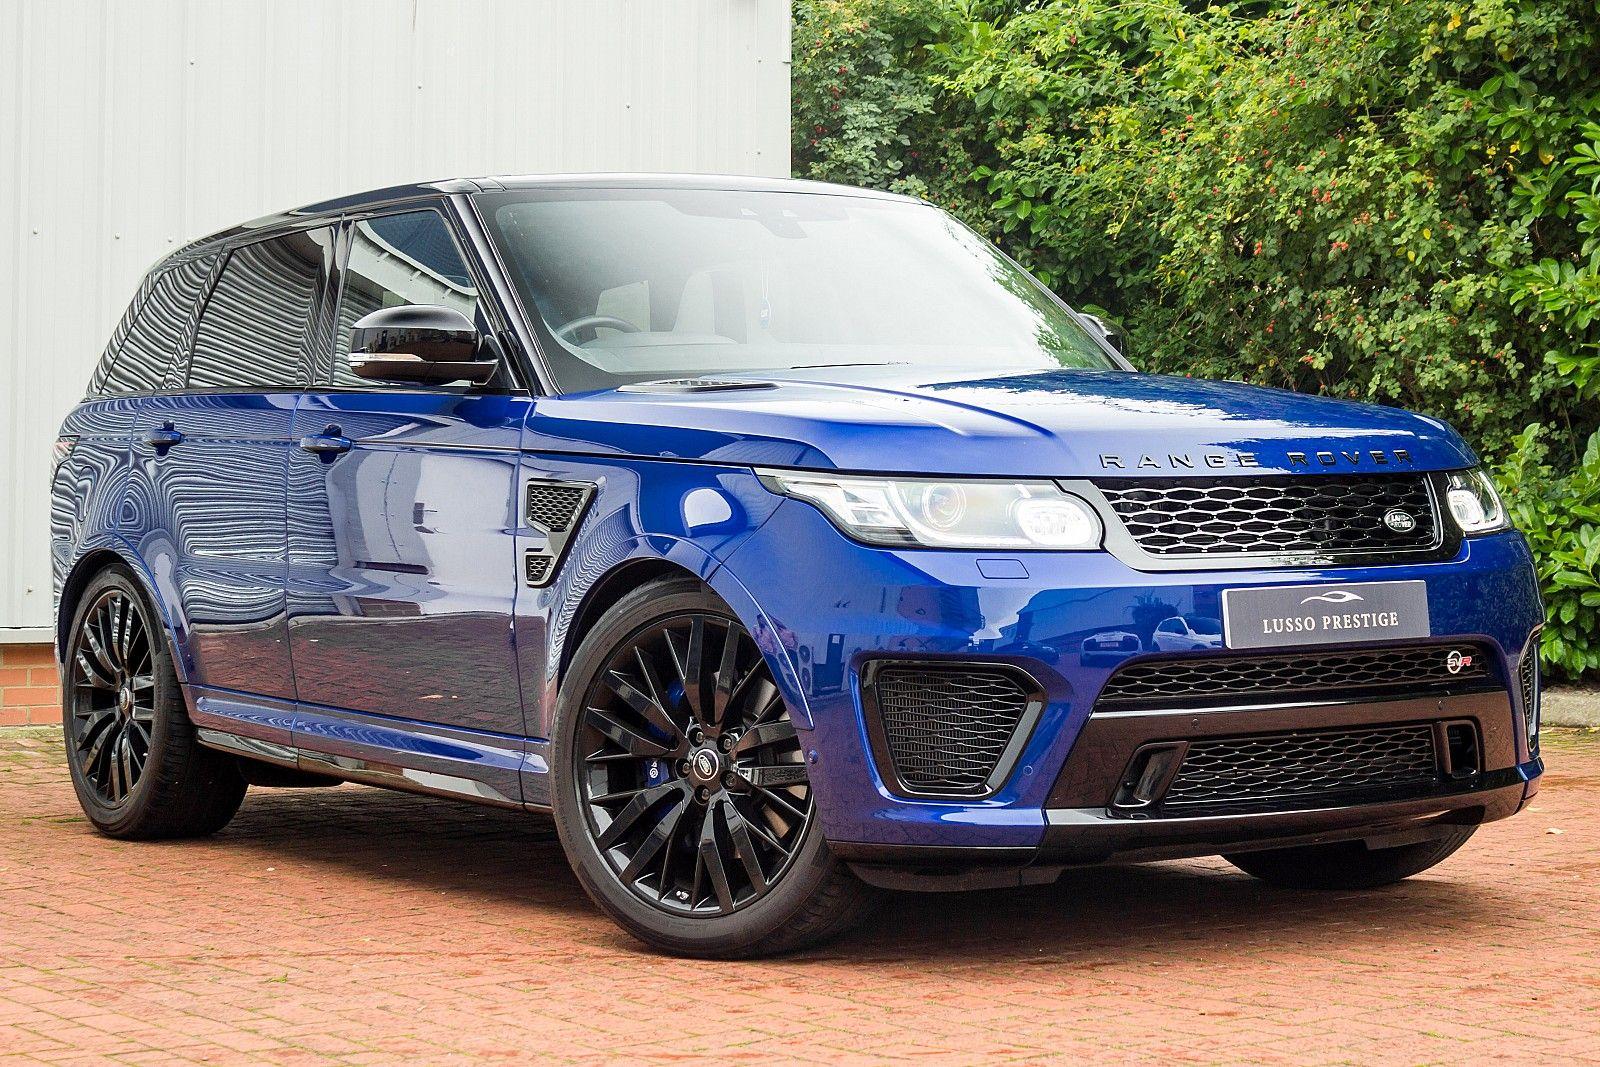 Range Rover Sport Svr Lusso Prestige Ltd United Kingdom For Sale On Luxurypulse In 2020 Range Rover Sport Range Rover Range Rover Svr